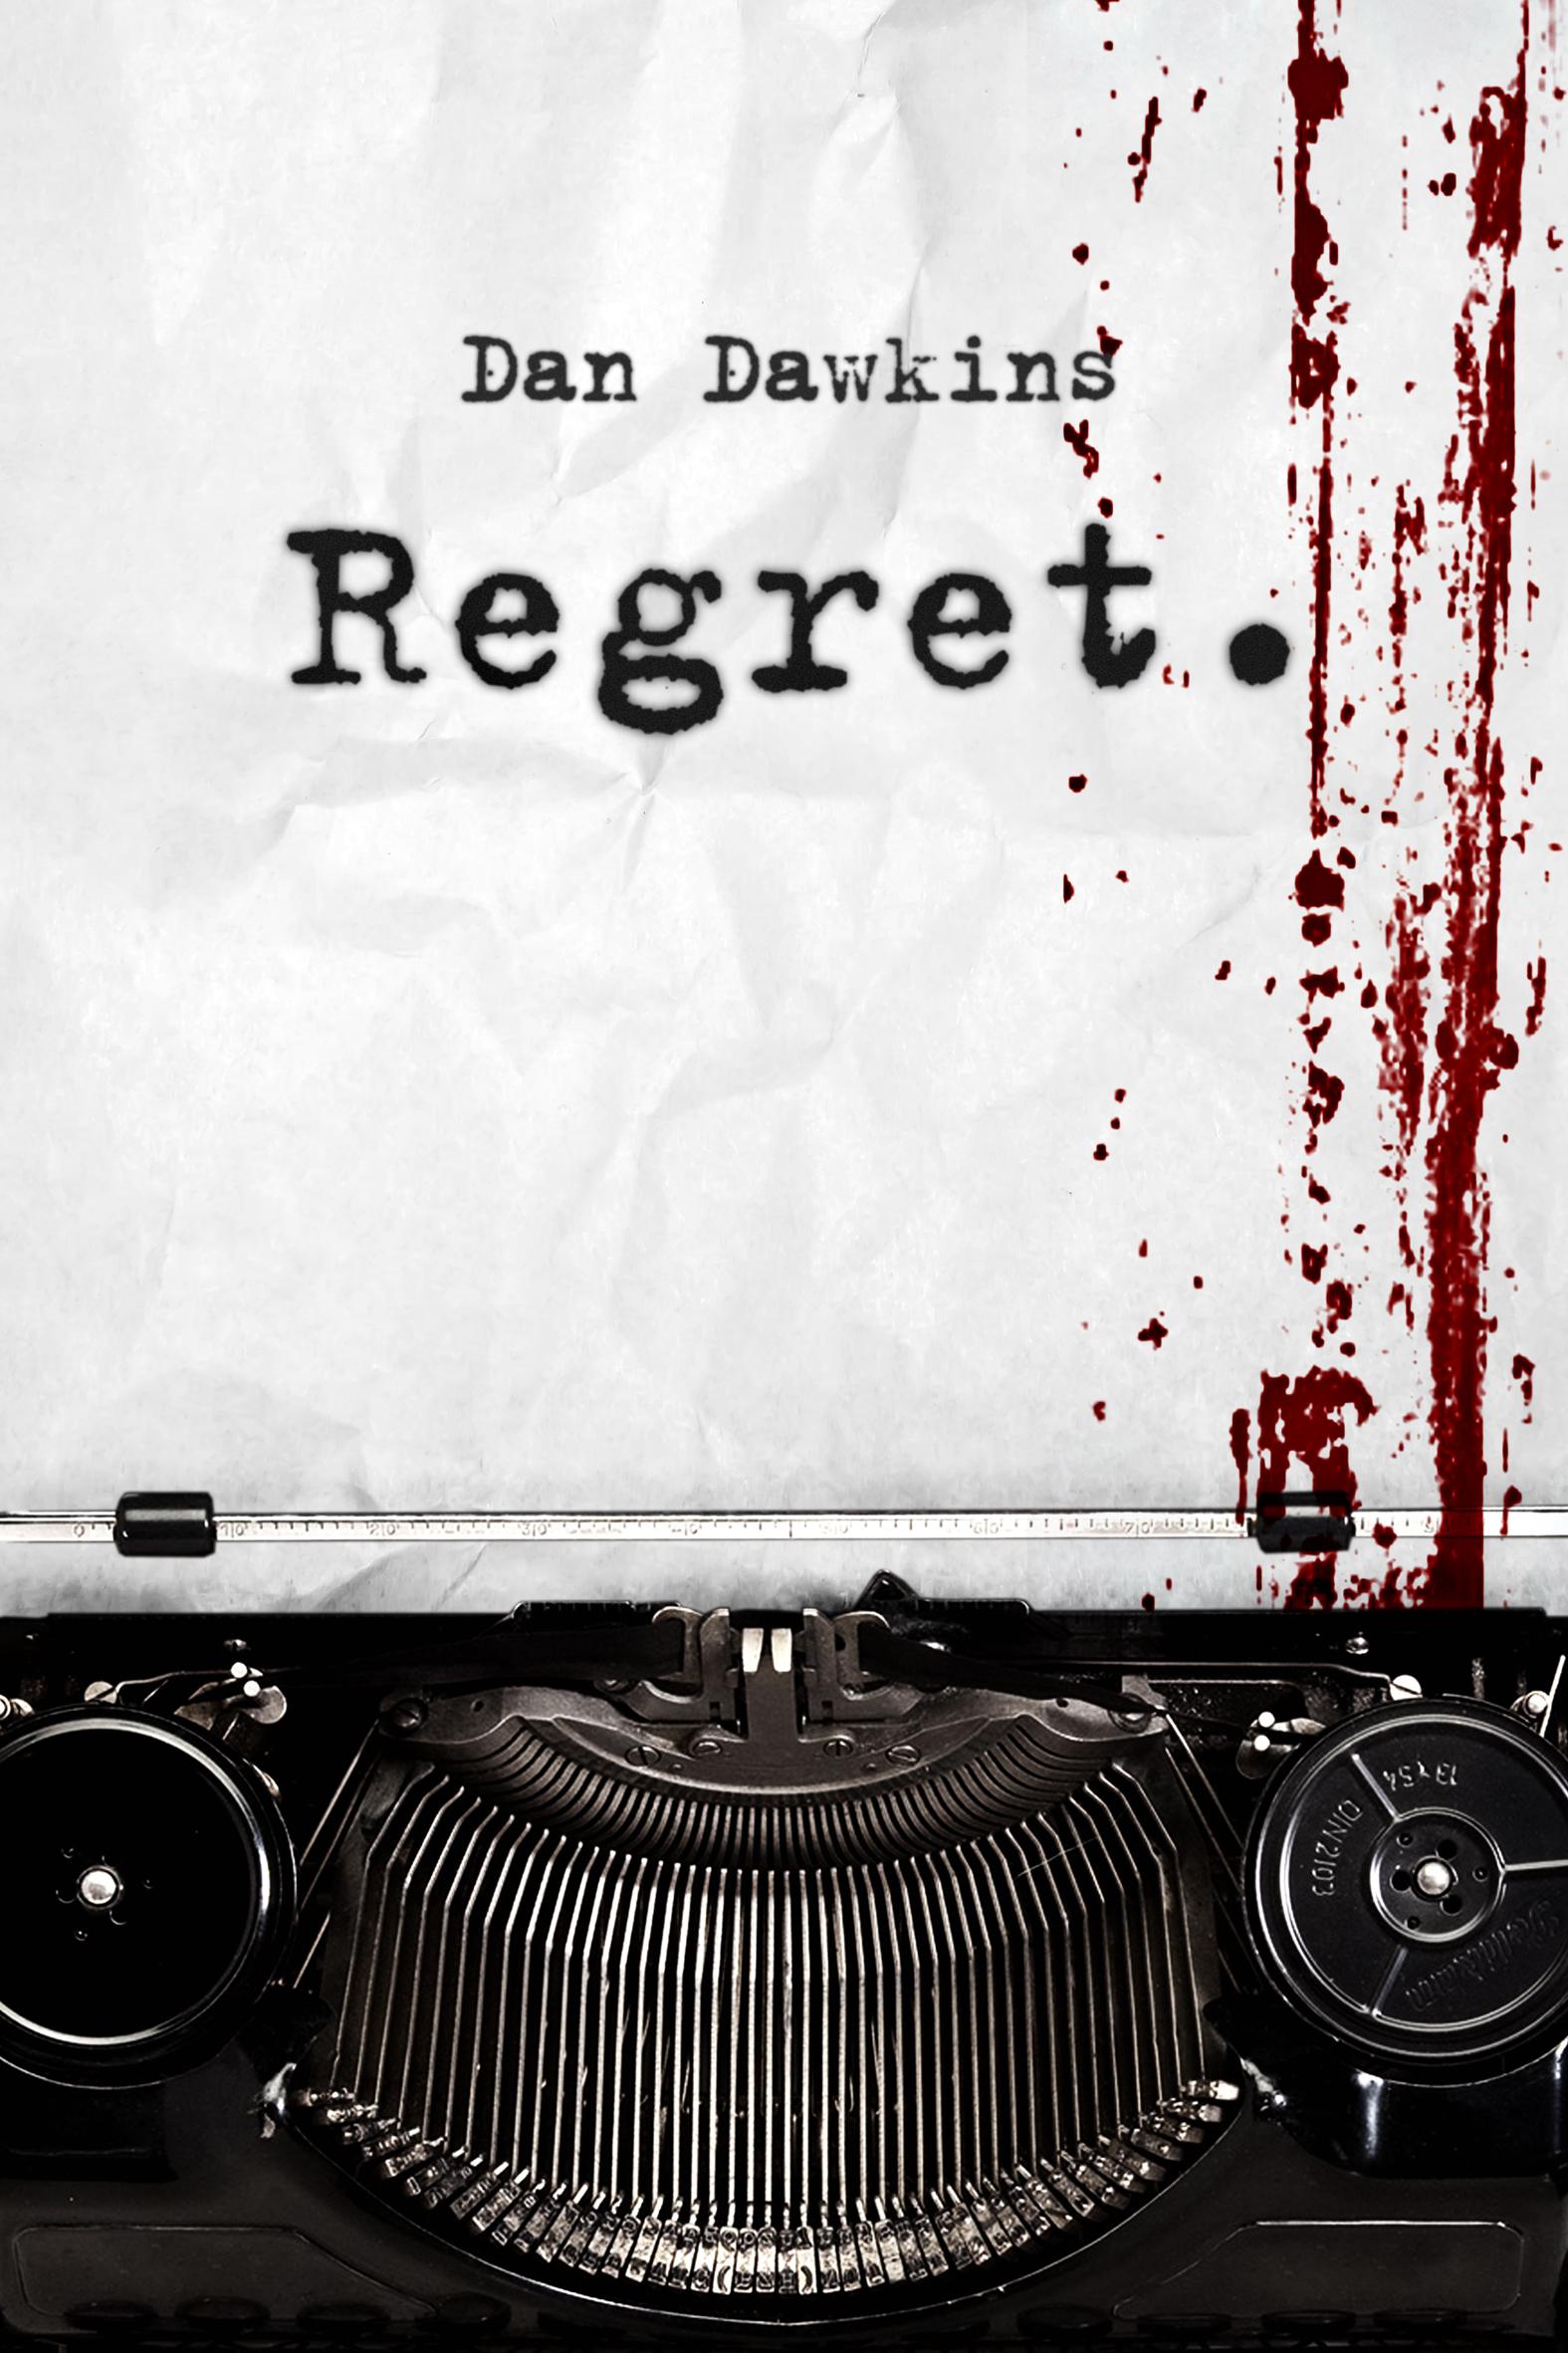 RegretEbook.jpg